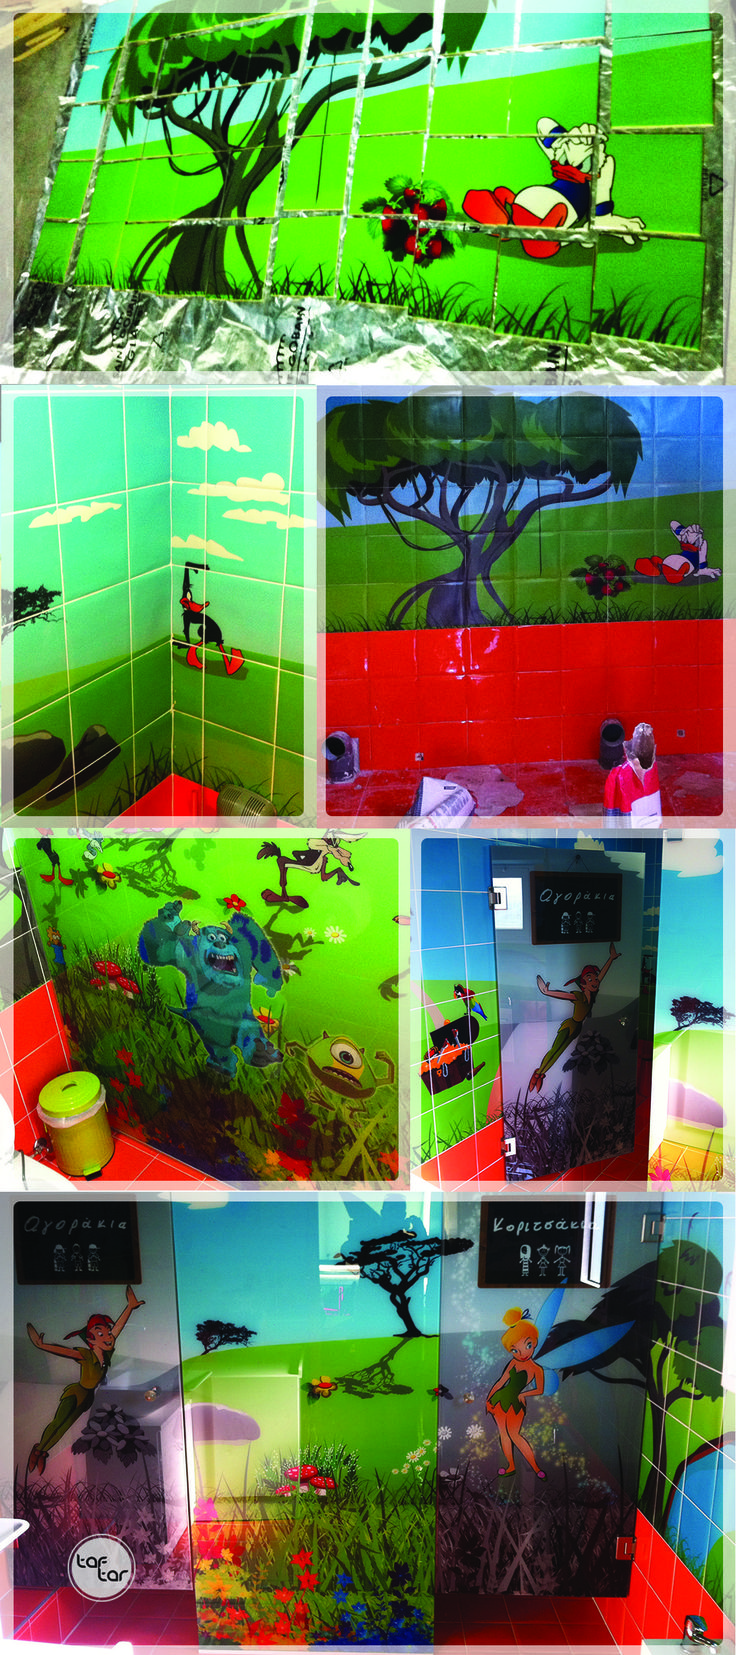 / UV printed tiles and security glasses for a playground's kids toilet. //  / UV εκτύπωση σε πλακάκια και κρύσταλλα ασφαλείας για την παιδική τουαλέτα παιδότοπου. //